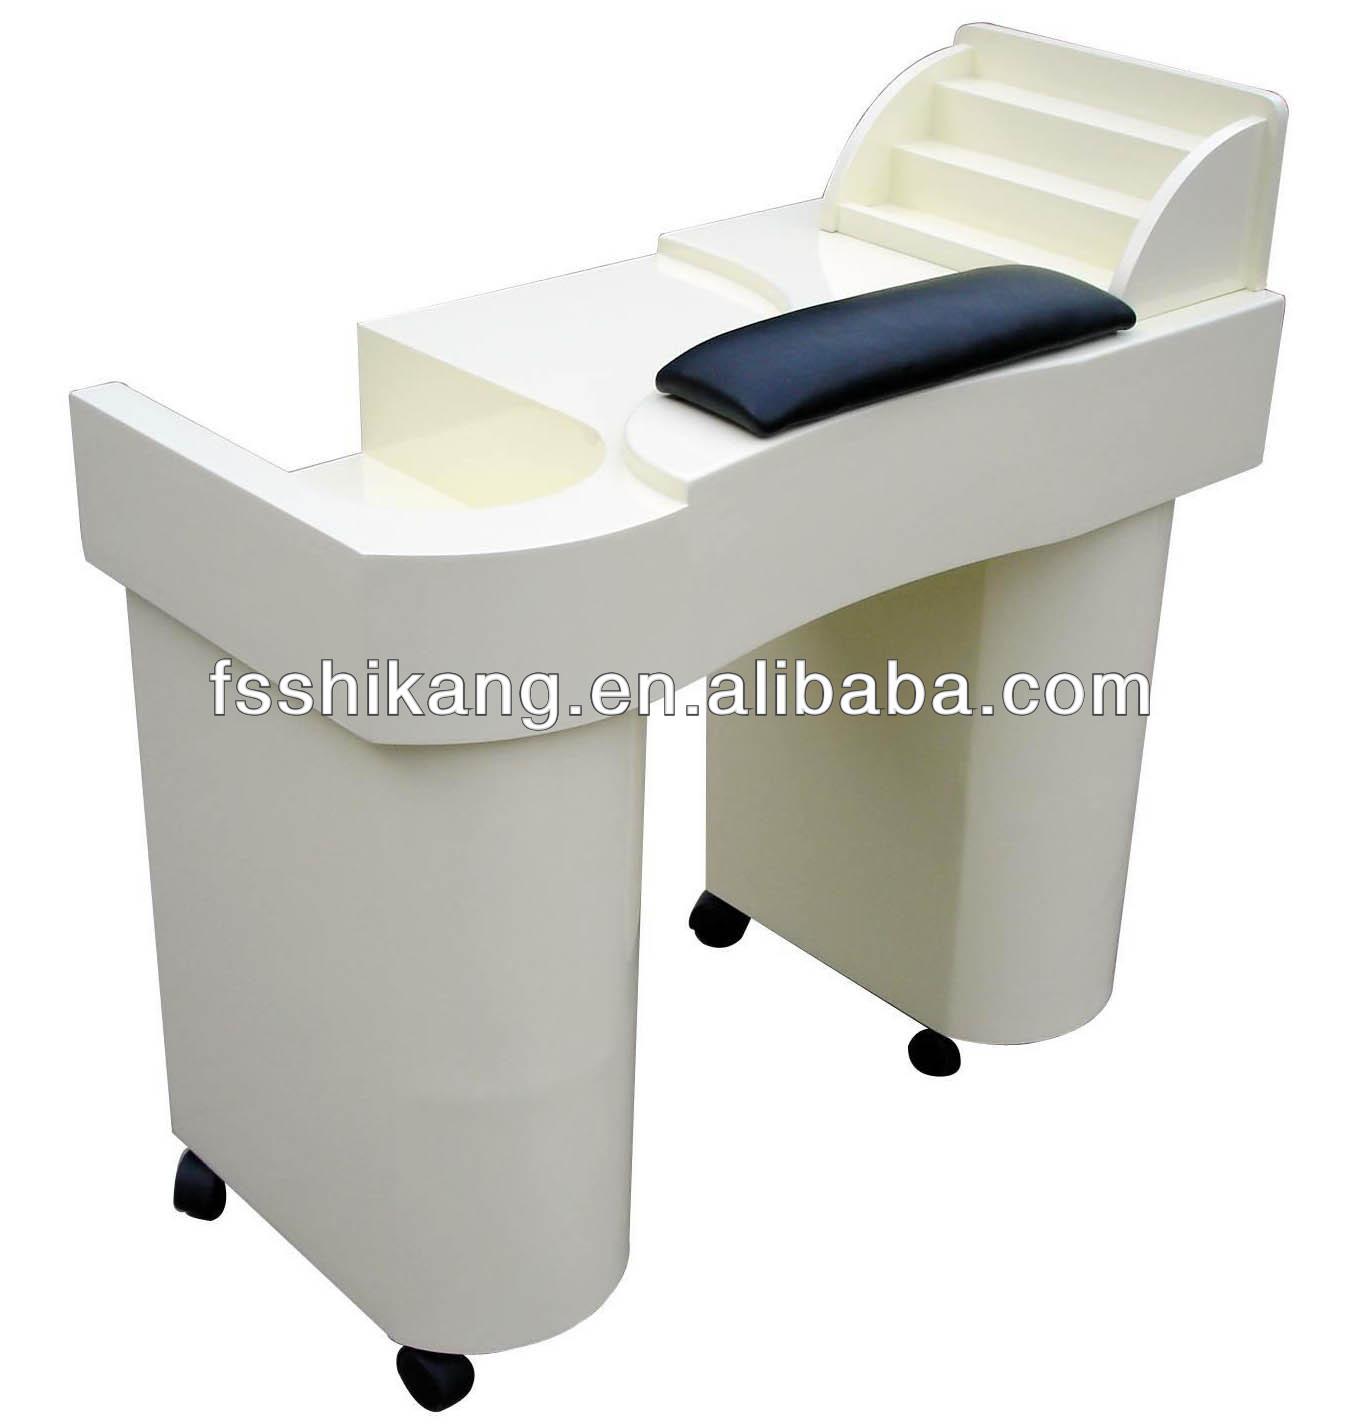 Nail Salon Furniture For Sale, Nail Salon Furniture For Sale ...